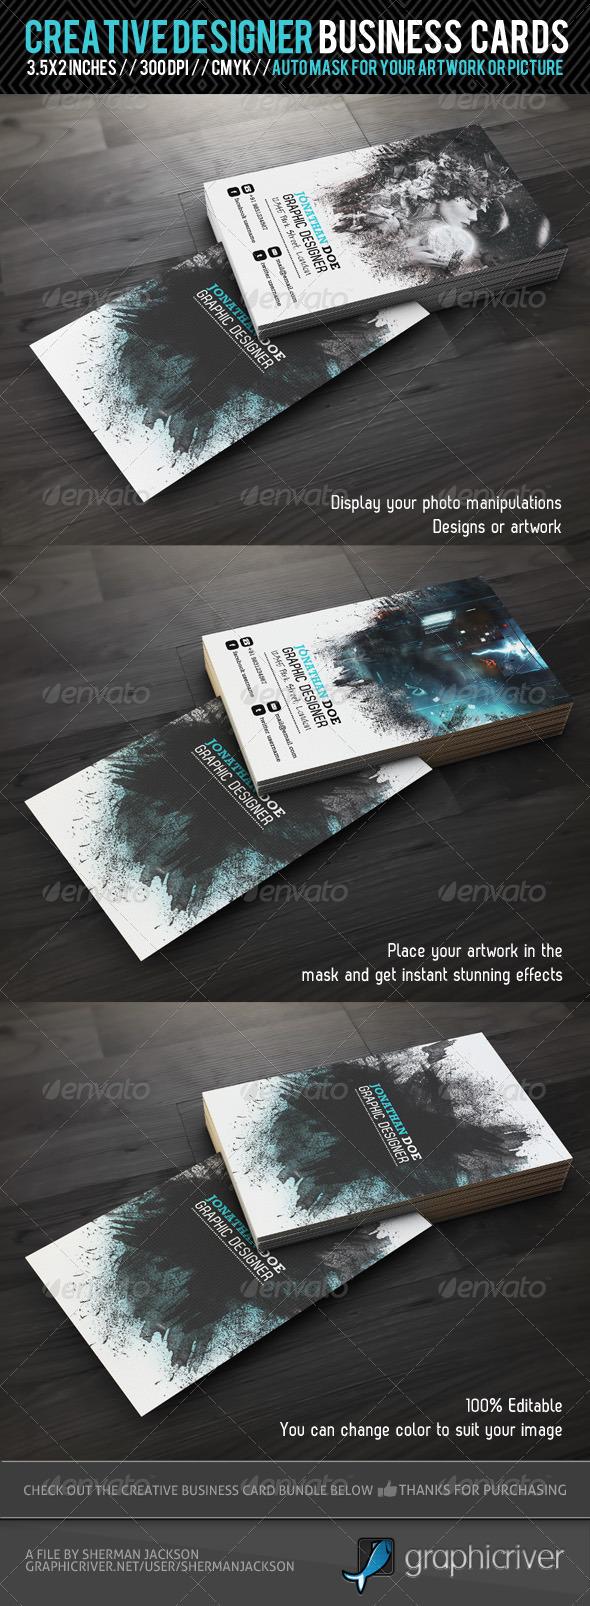 GraphicRiver Creative Designer Business Card 1685337